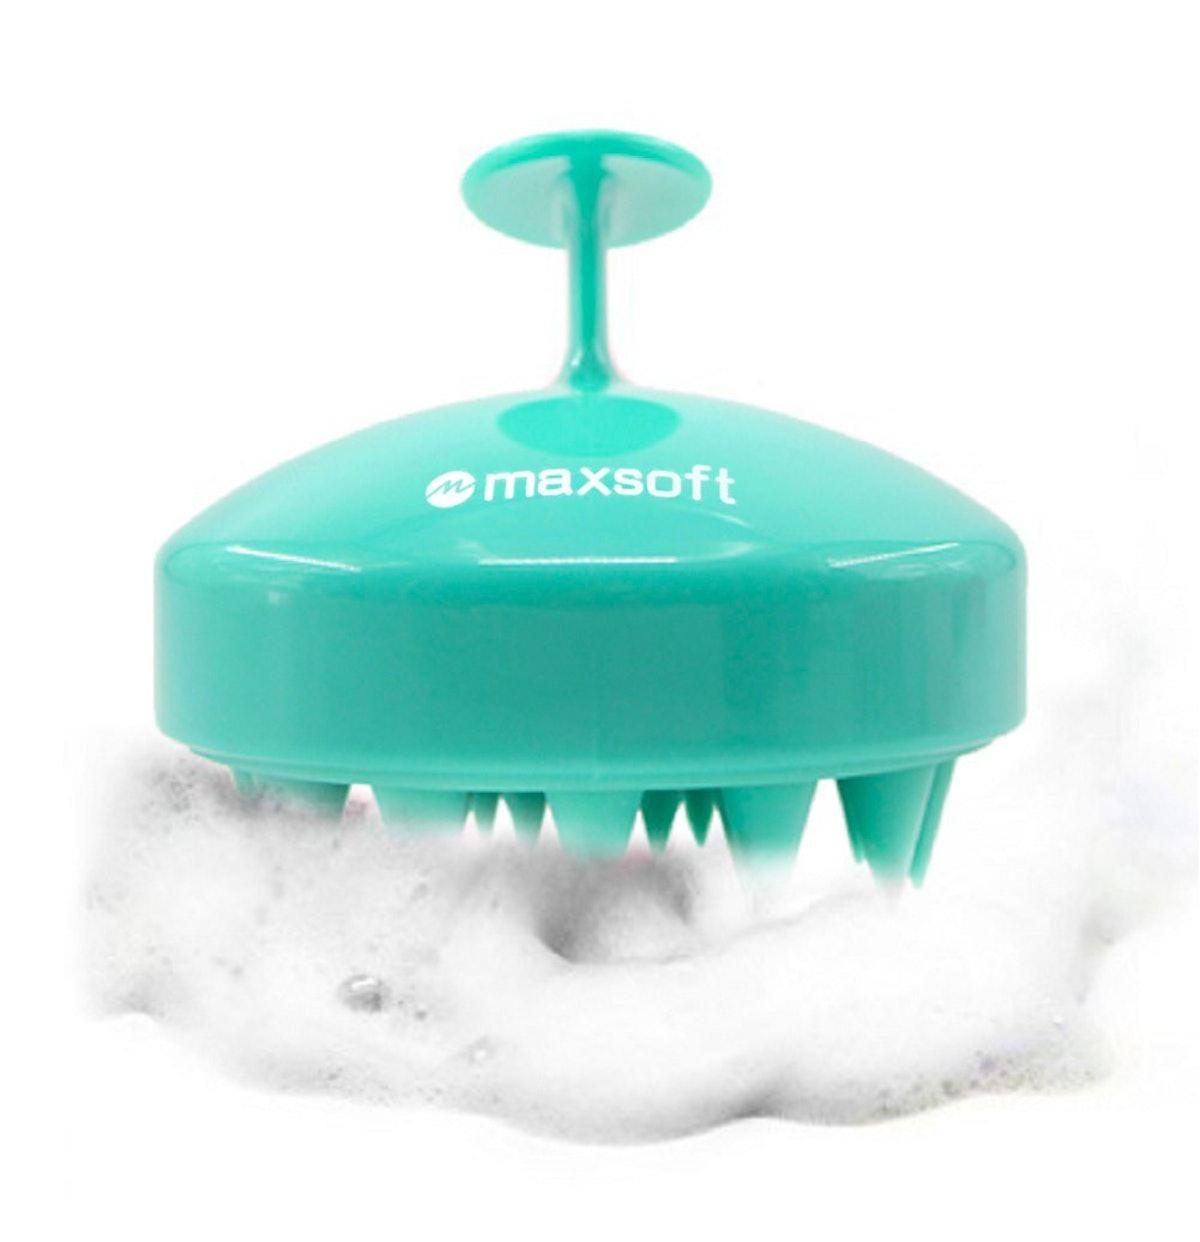 Maxsoft Shampoo Brush